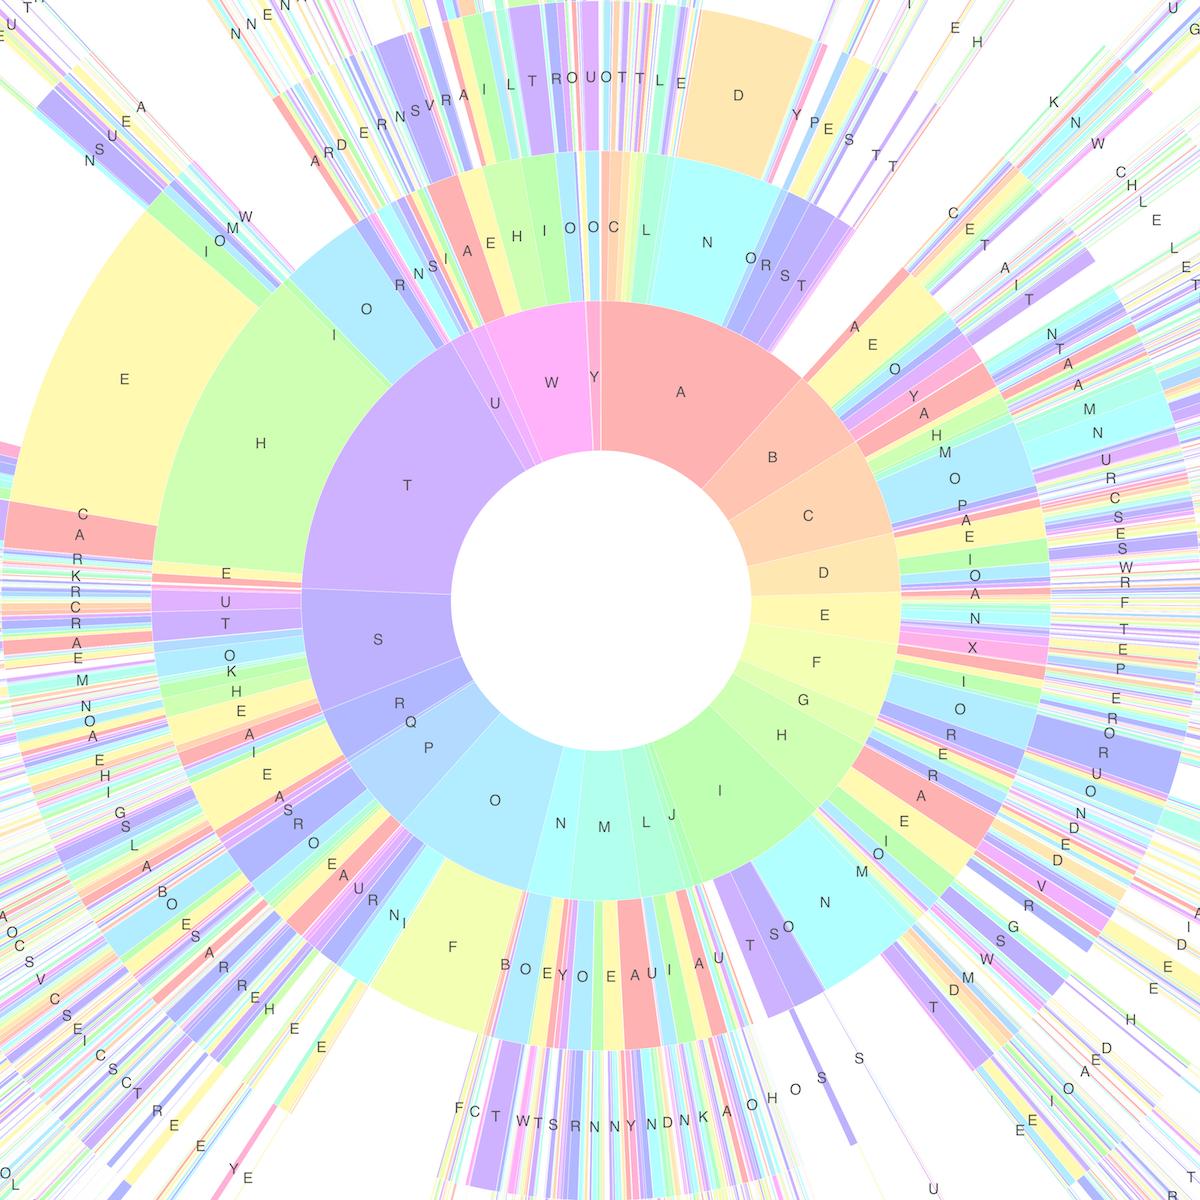 Sunburst Chart of Common English Words, small